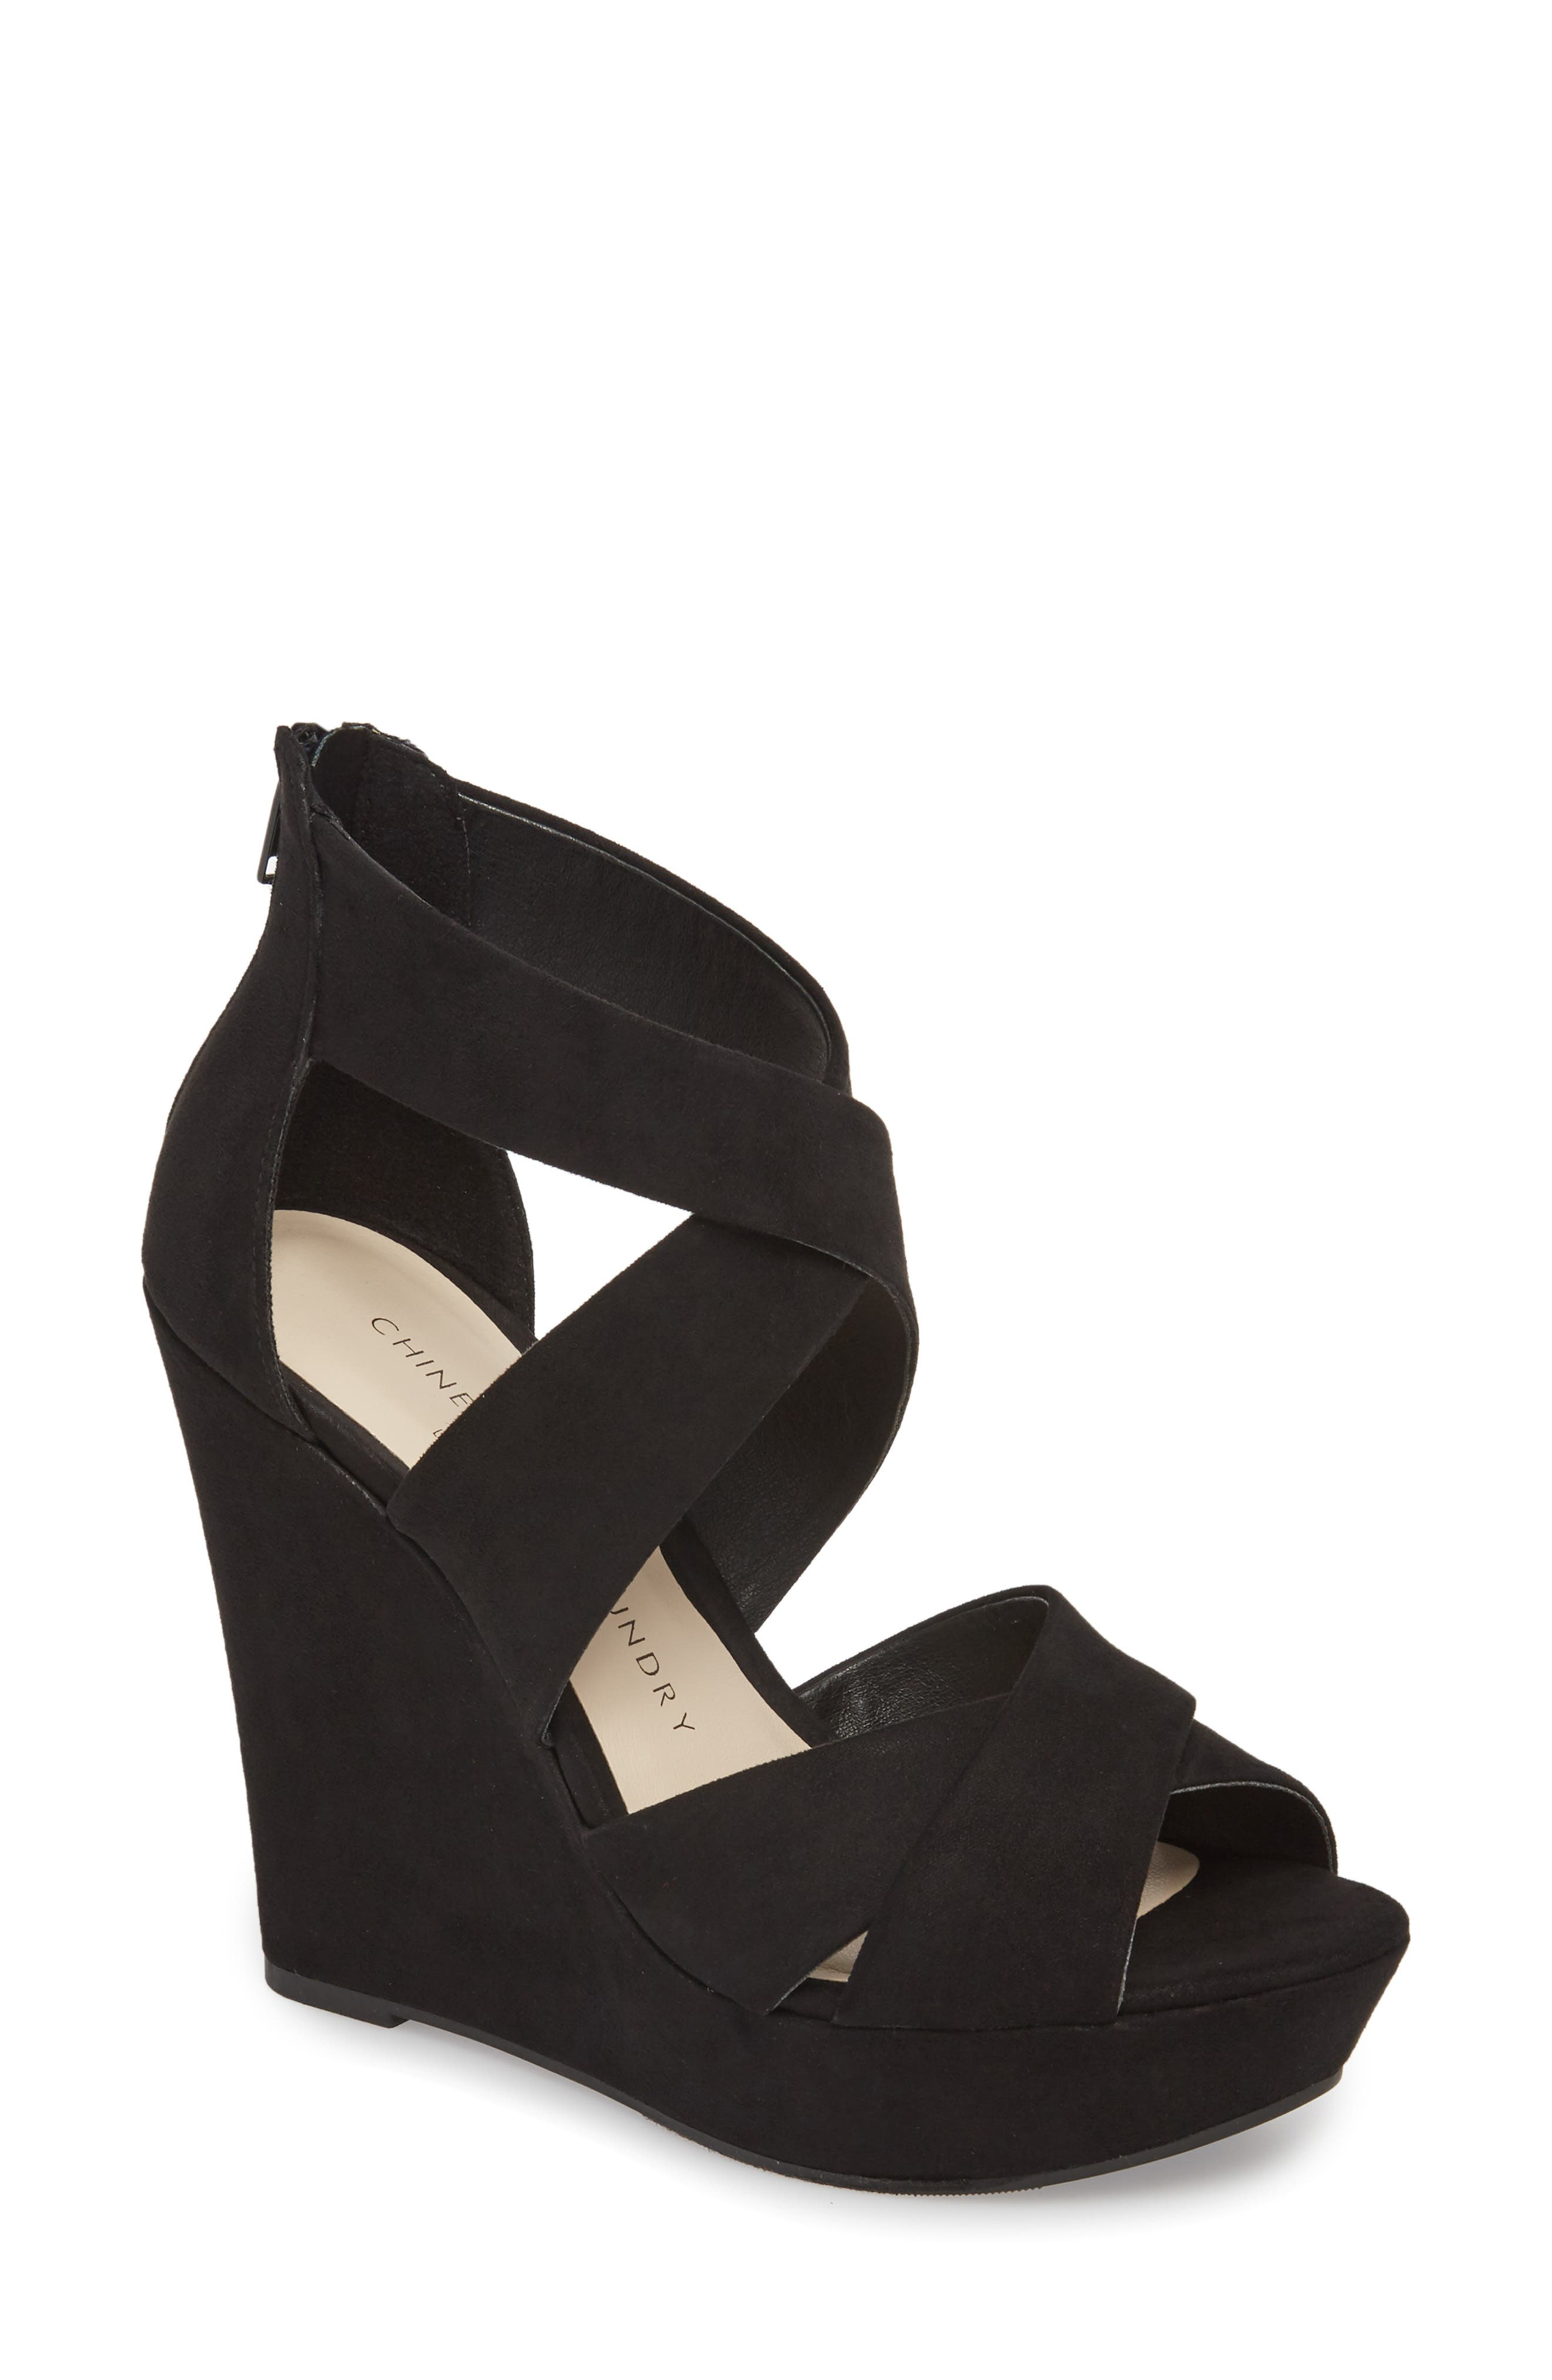 Milani Platform Wedge Sandal,                             Main thumbnail 1, color,                             005